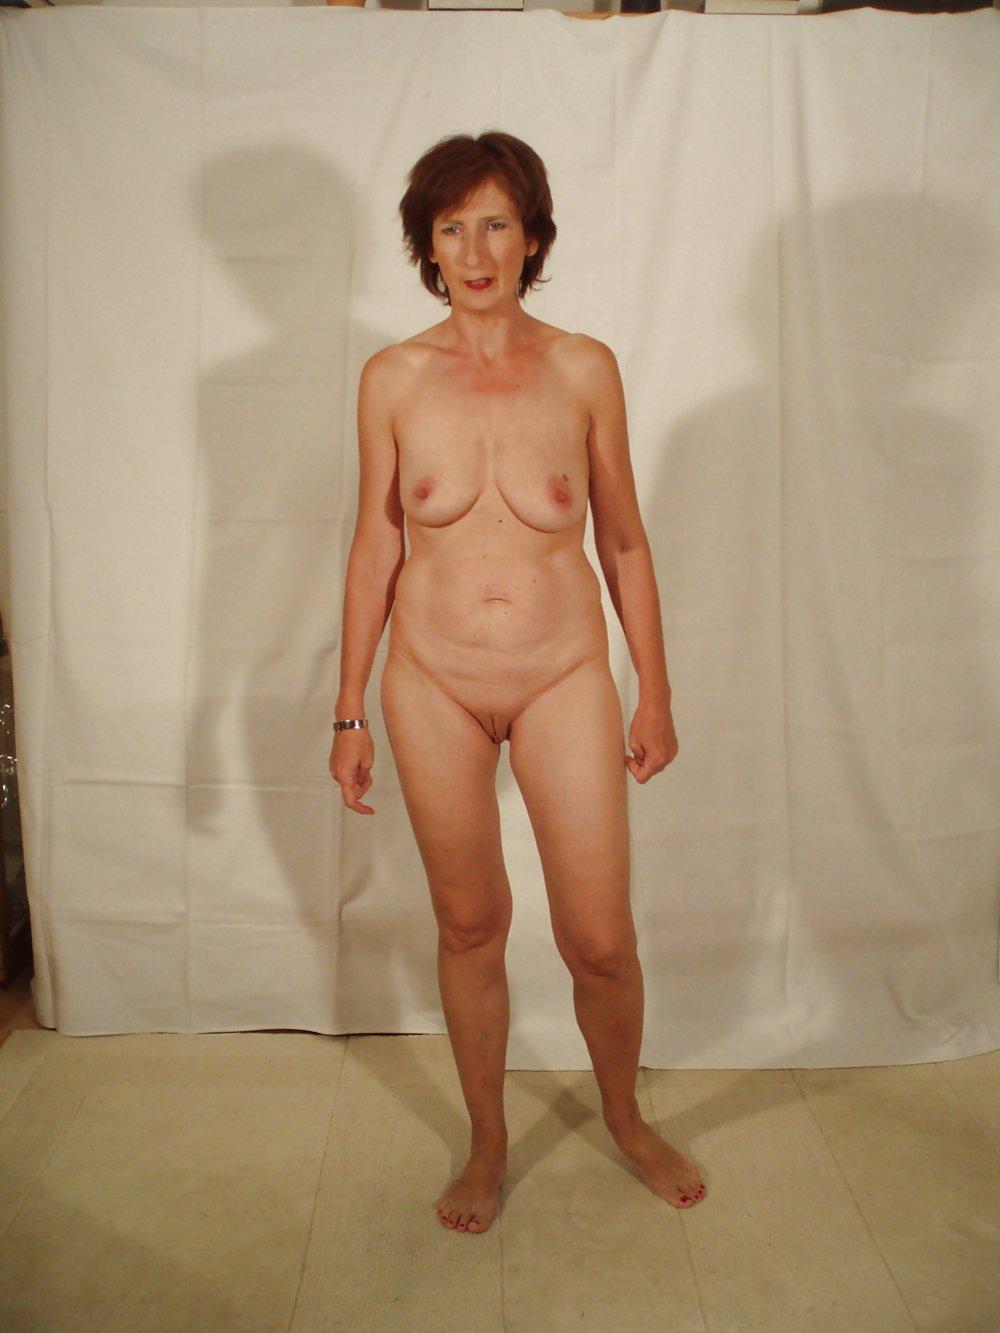 Ehefrau Nacktbilder